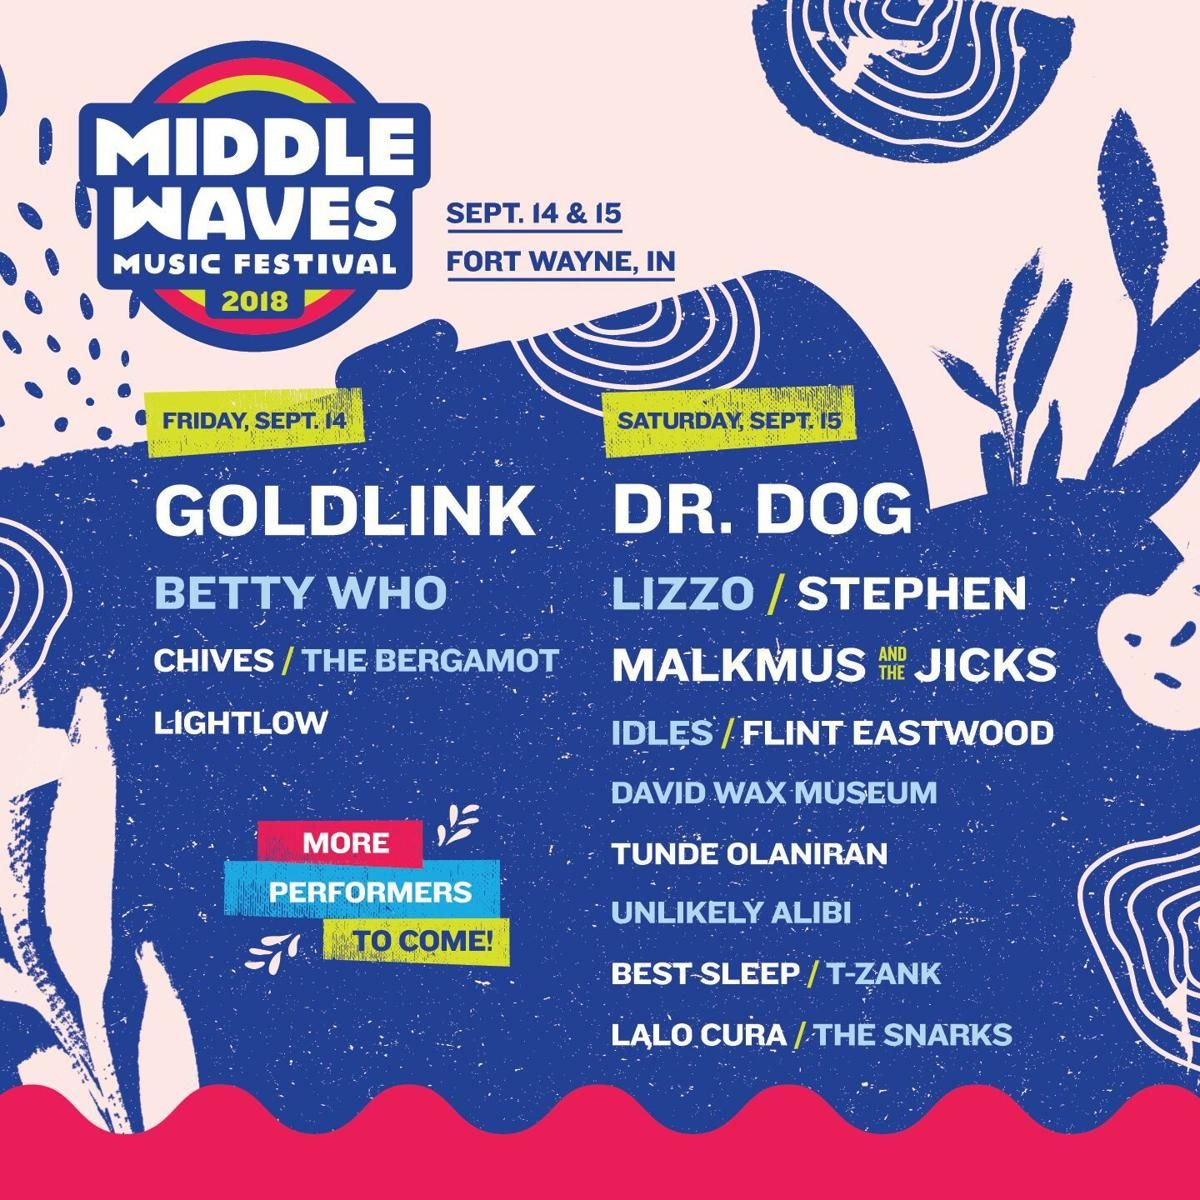 Fort Wayne S Middle Waves Music Festival Announces 2018 Lineup Music Festival Festival Betty Who